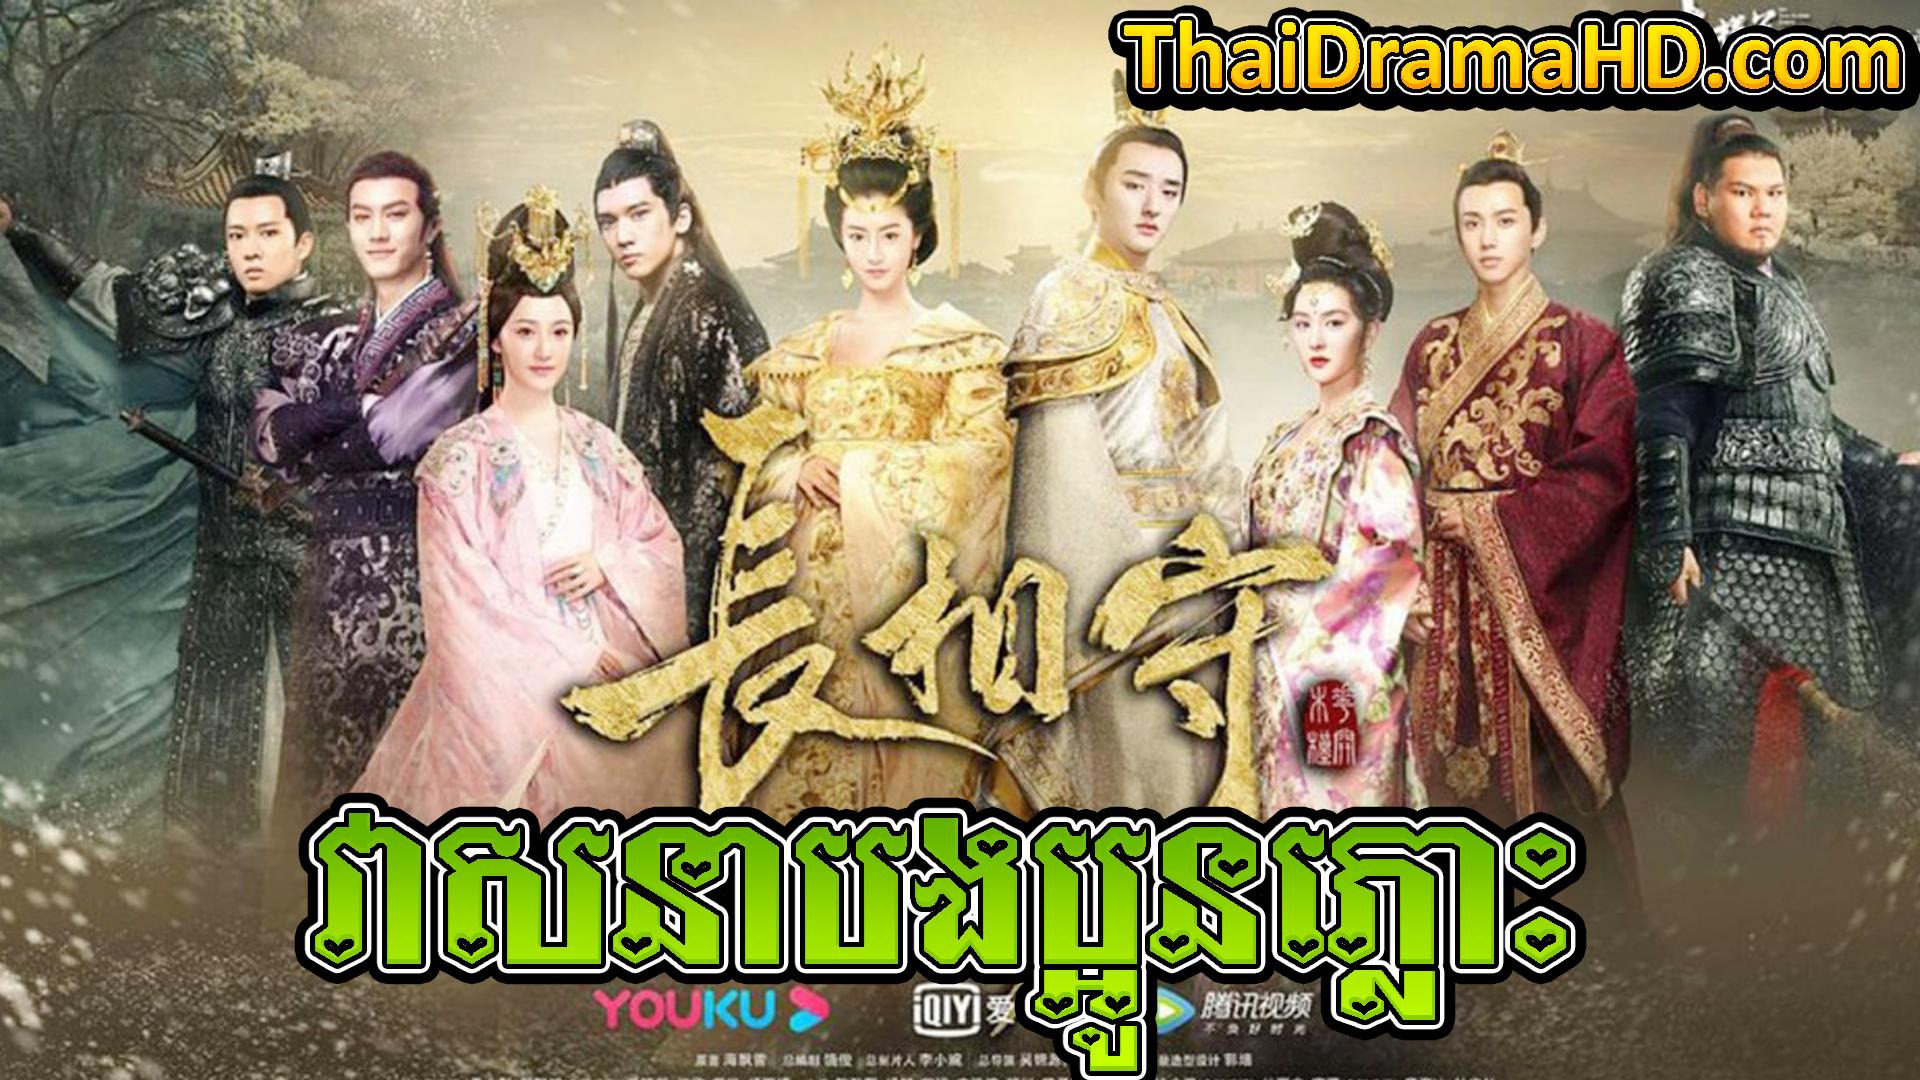 Veasna Bong Paoun Phlouh | Thai Drama | Khmer Movie | Phumikhmer | movie-khmer | video4khmer | khmotions | kolabkhmer | khmer drama | ksdrama | cookingtips | roscheat | khmertimeskh | khmerkomsan | phumi7 | merlkon | film2us | movie2kh | sweetdrama | khmercitylove | khreplay | tvb cambodia drama | ckh7 | srokthai | phumimedia | phumi8 | khmer avenue | khmer search | Soyo | khmerfans